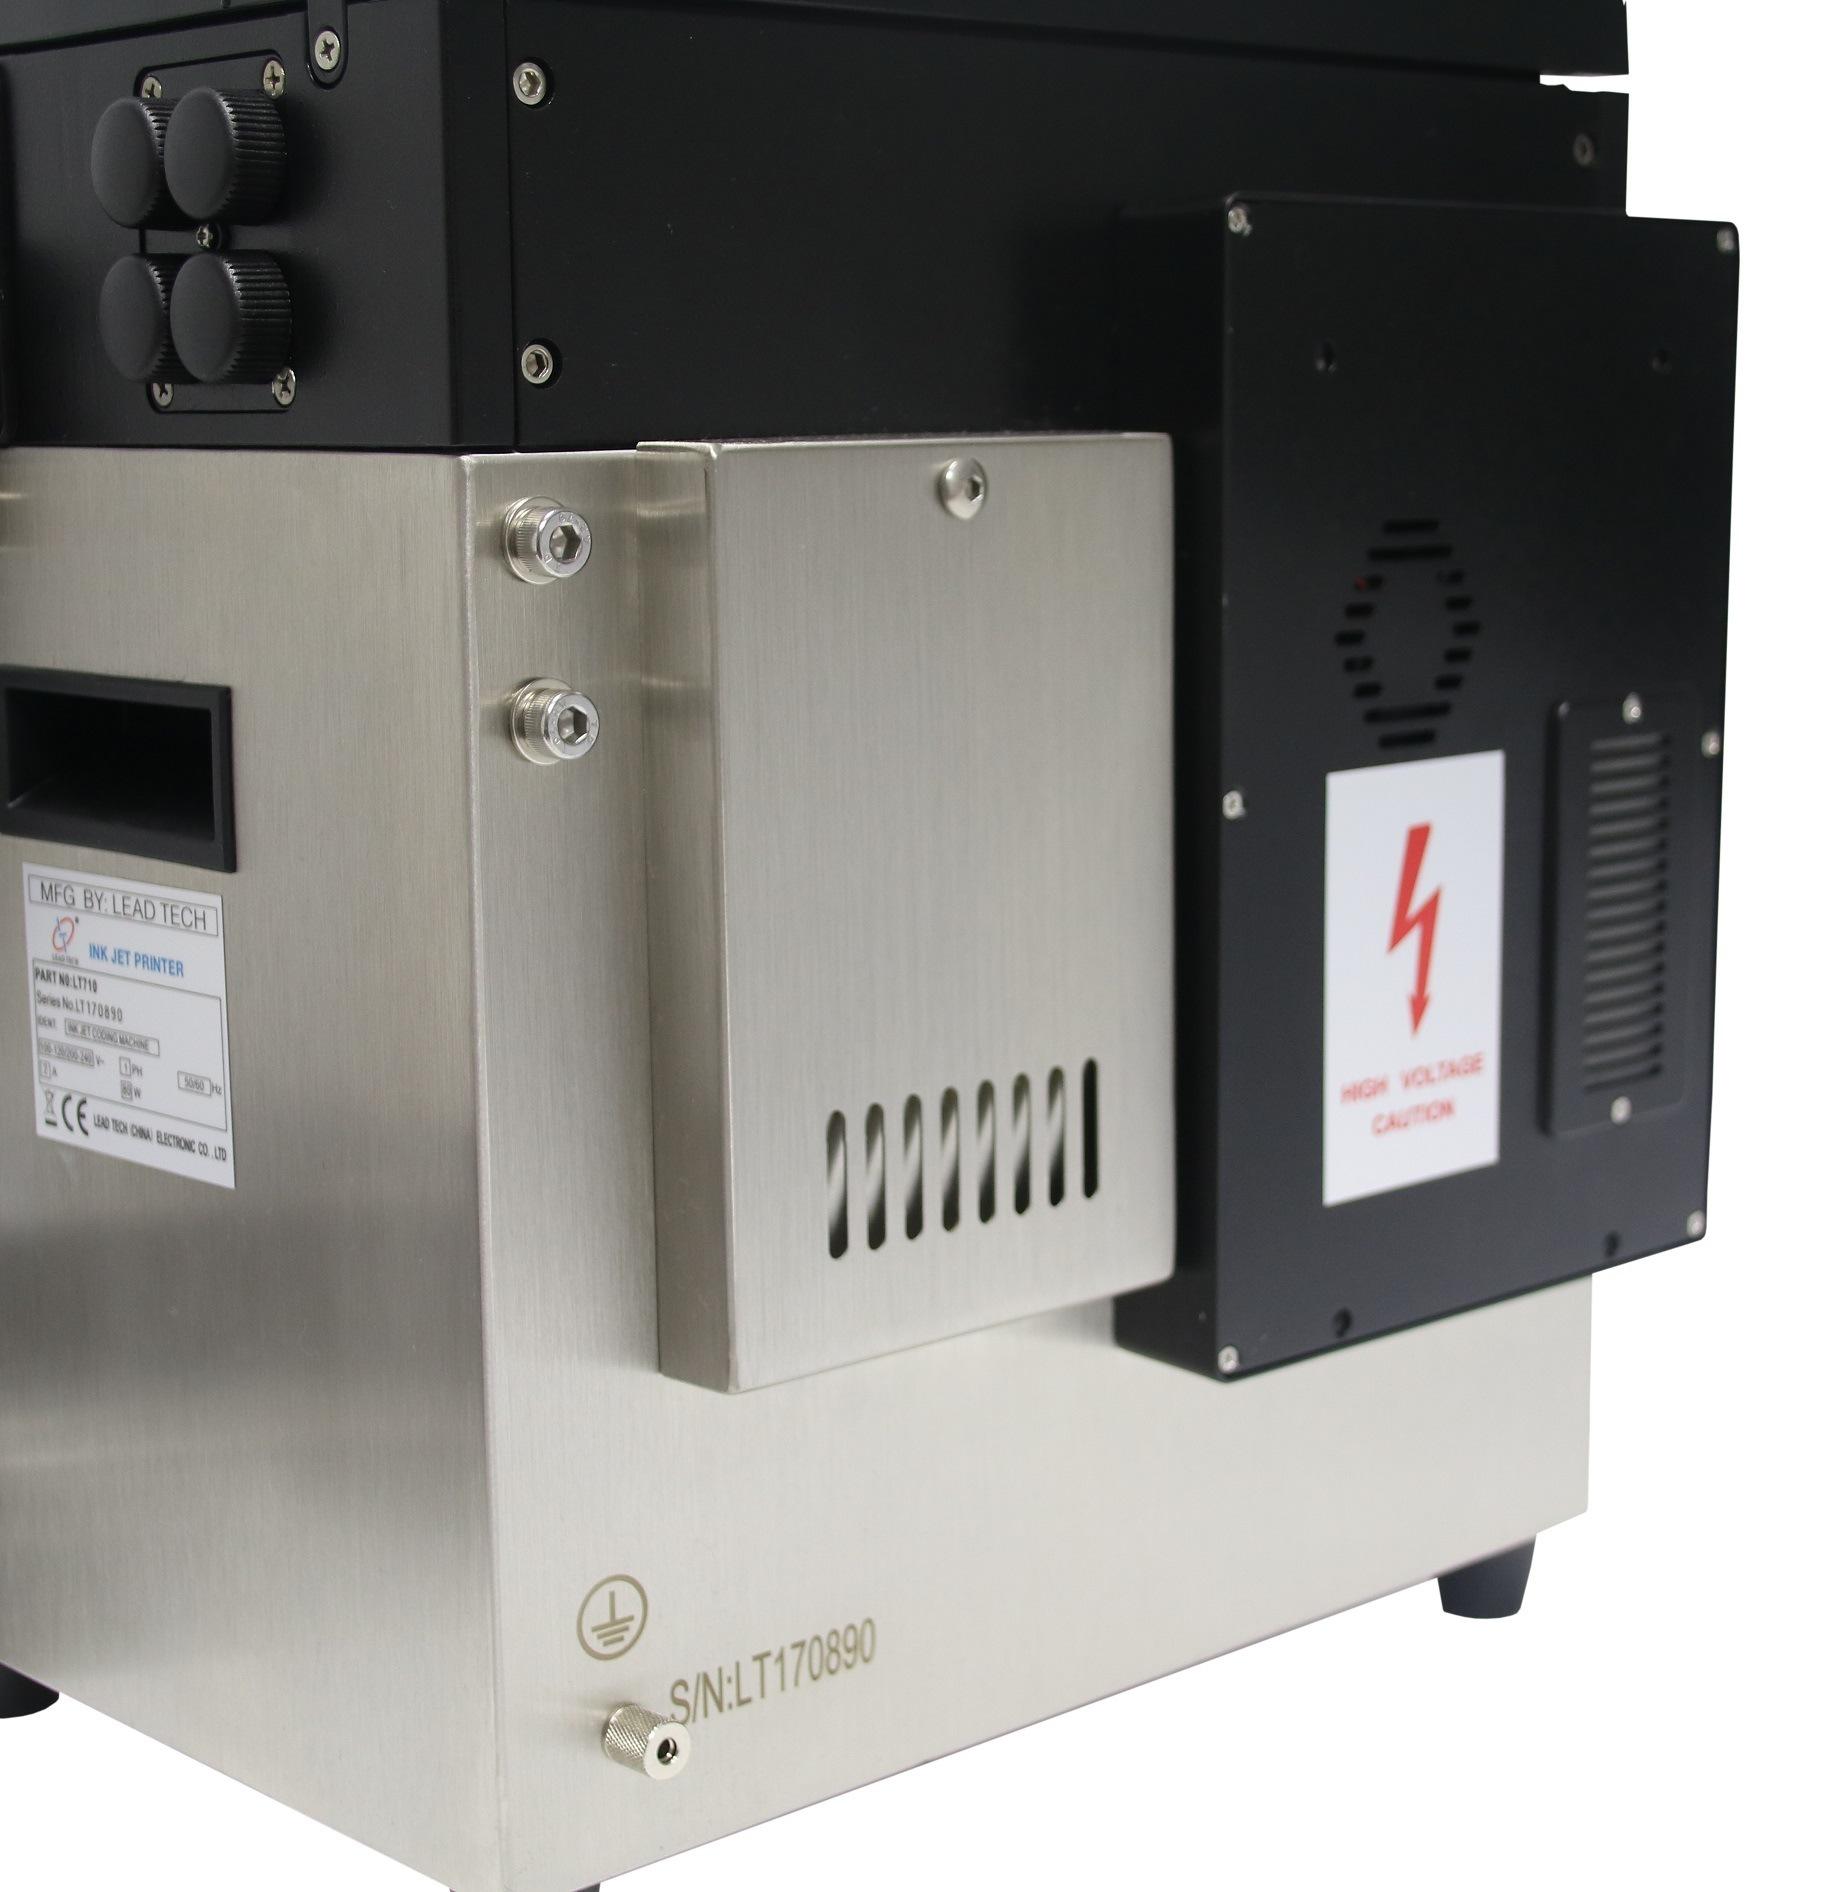 Lead Tech Lt760 Small Characters HDPE Coding Inkjet Printer